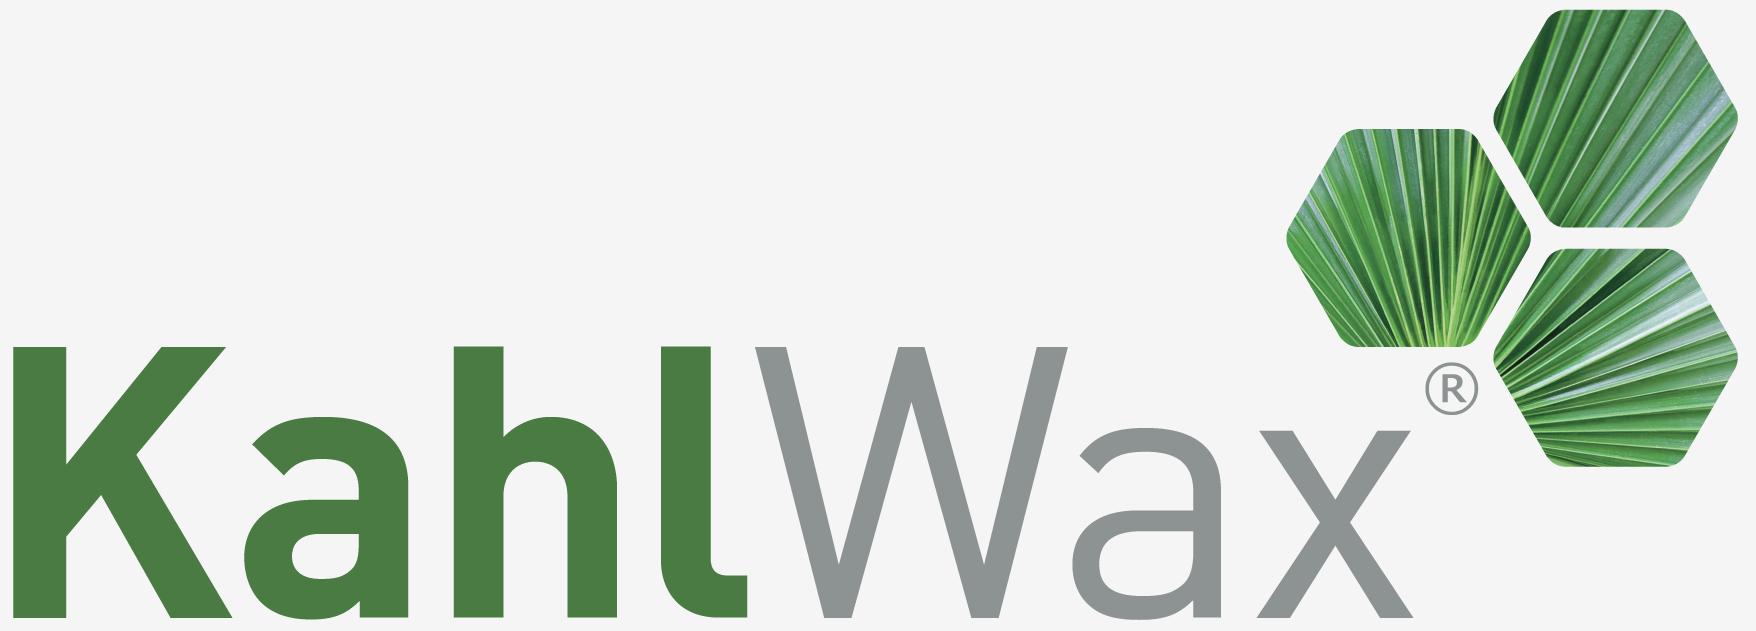 kahlwax_logo